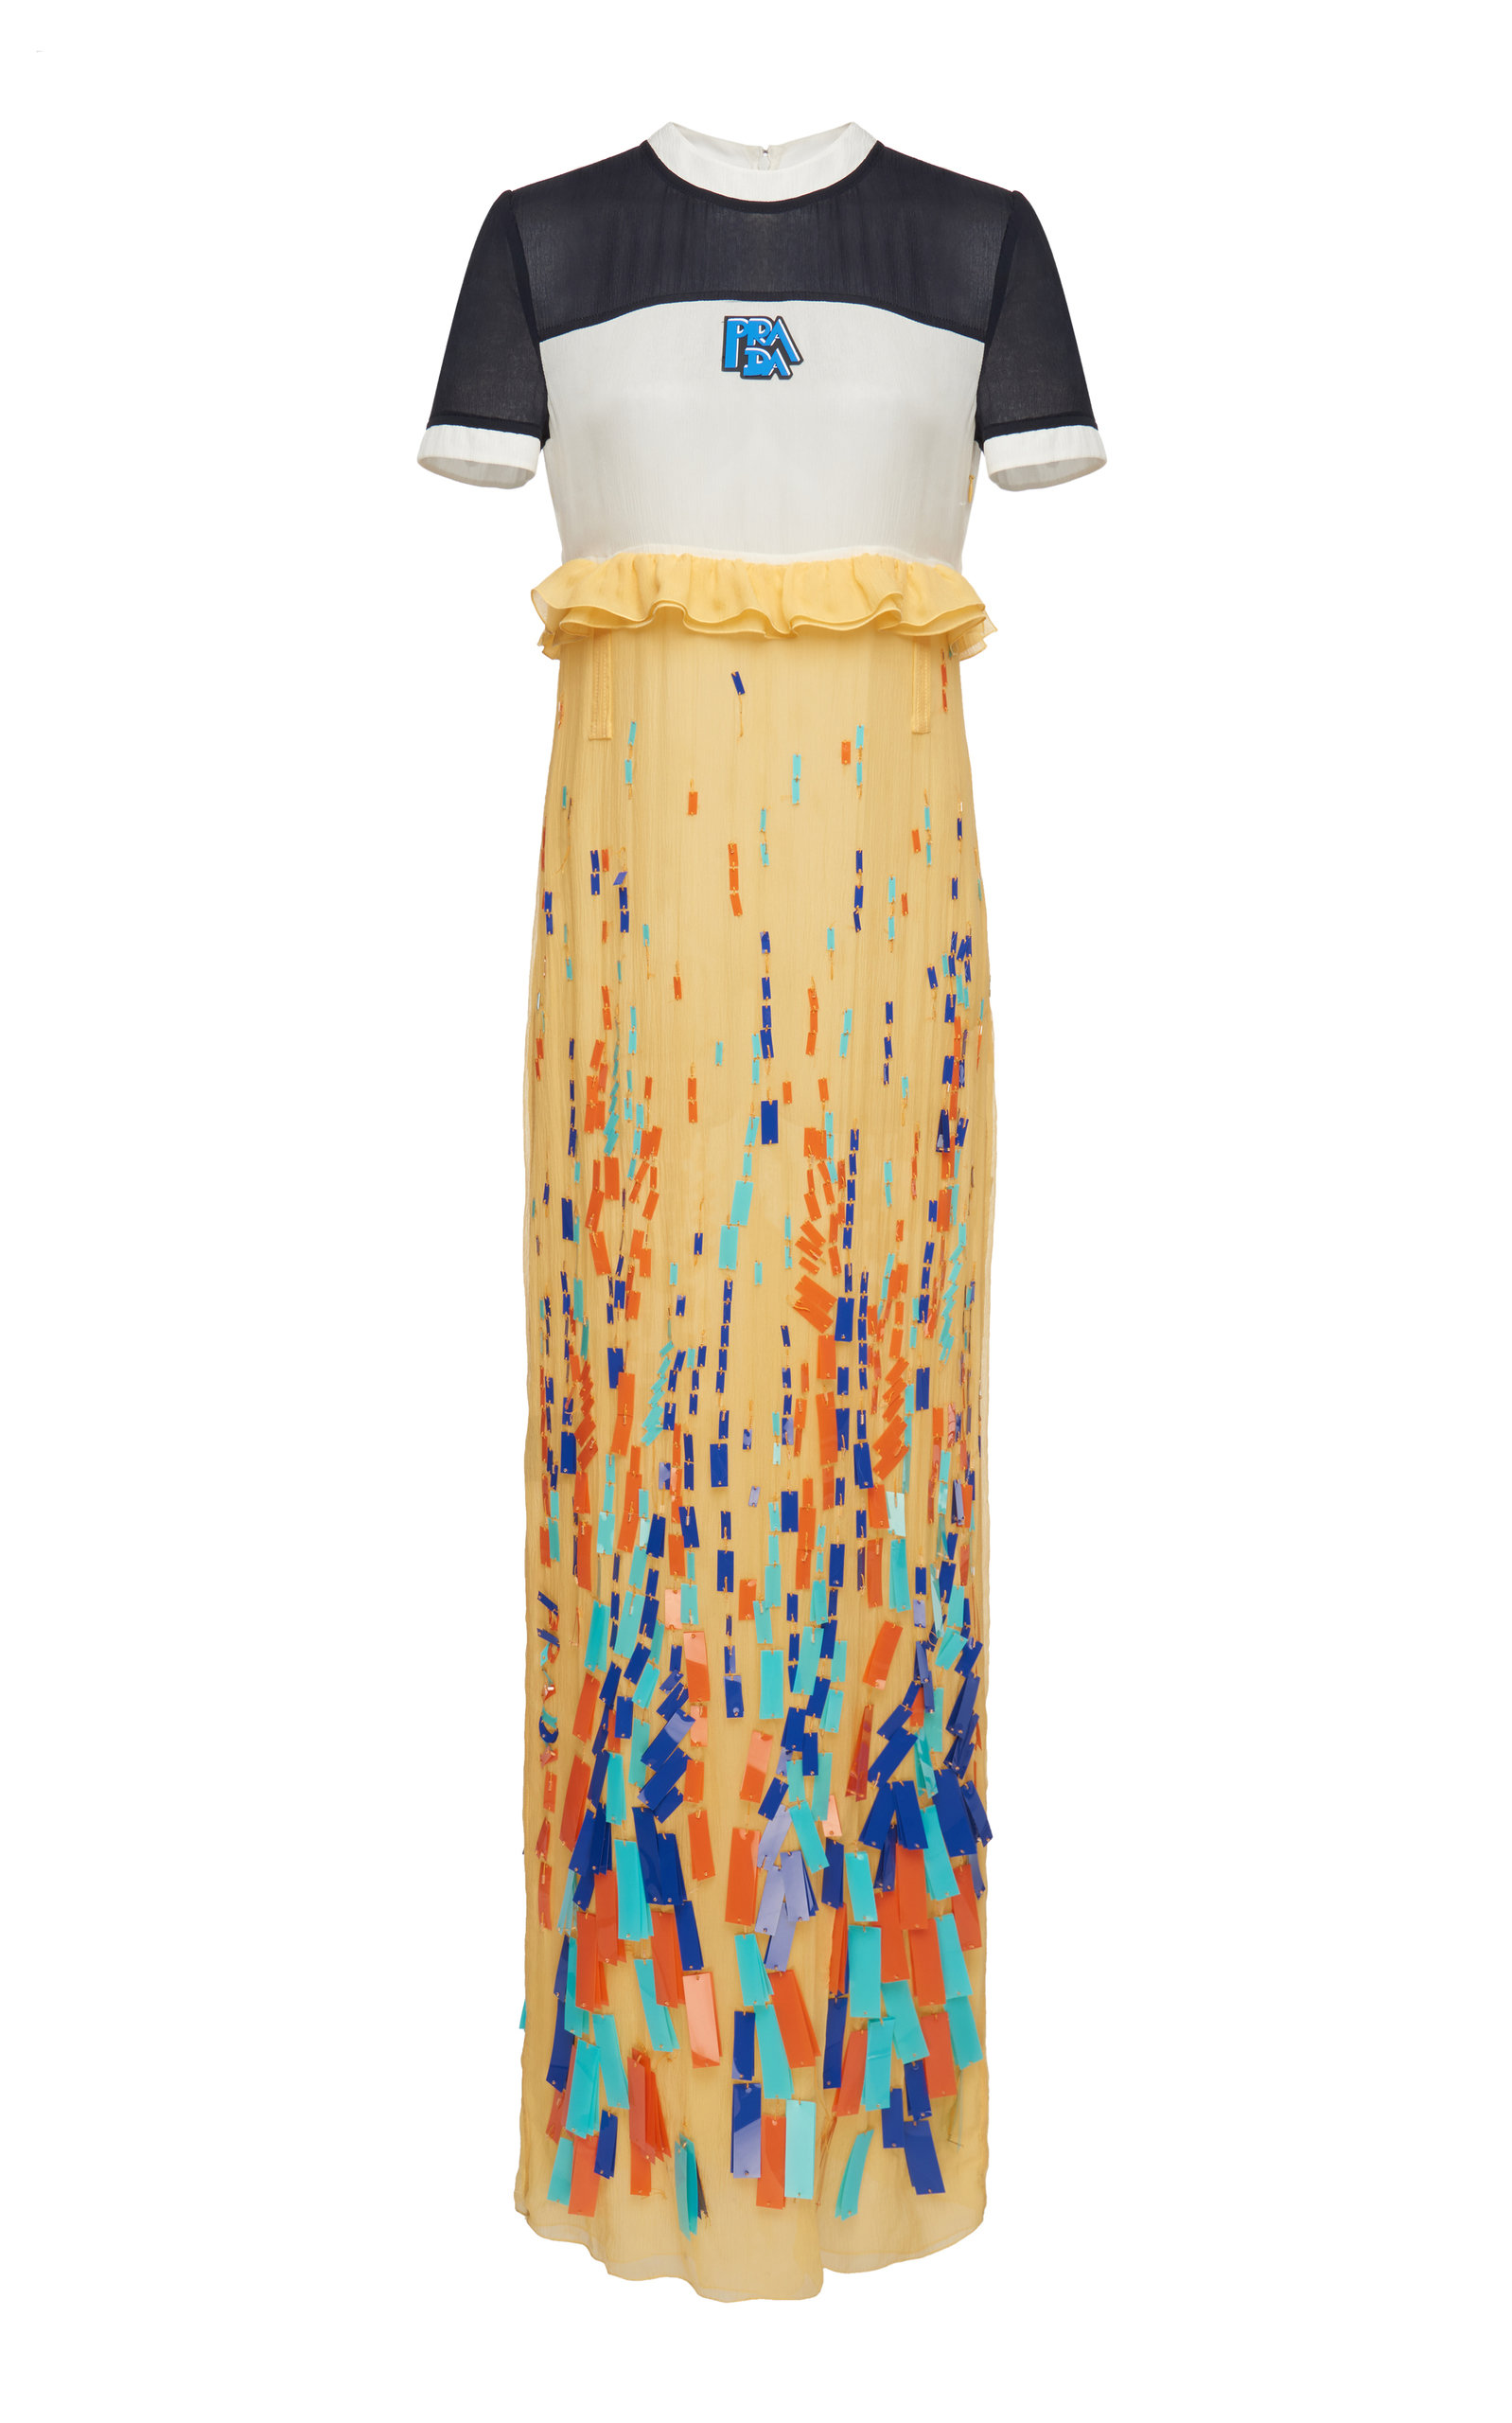 Buy Prada Paneled Embroidered Chiffon Dress online, shop Prada at the best price